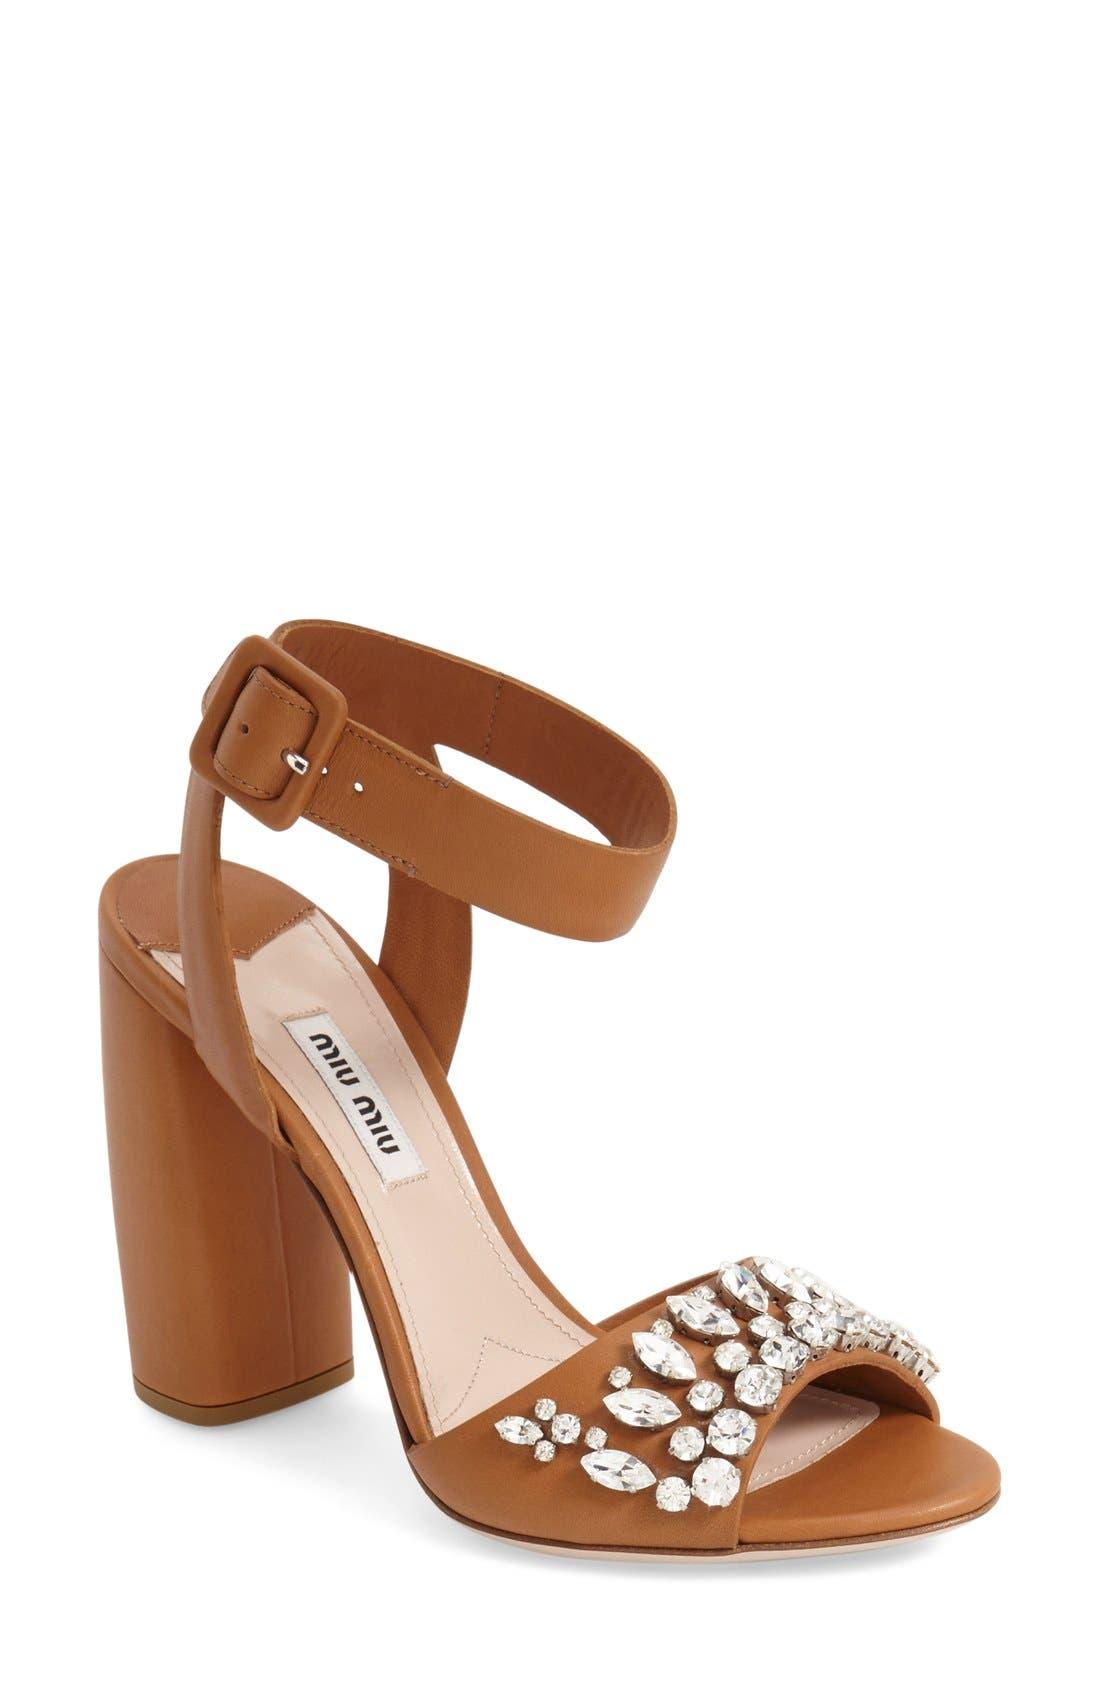 Alternate Image 1 Selected - Miu Miu 'Jewel' Sandal (Women)